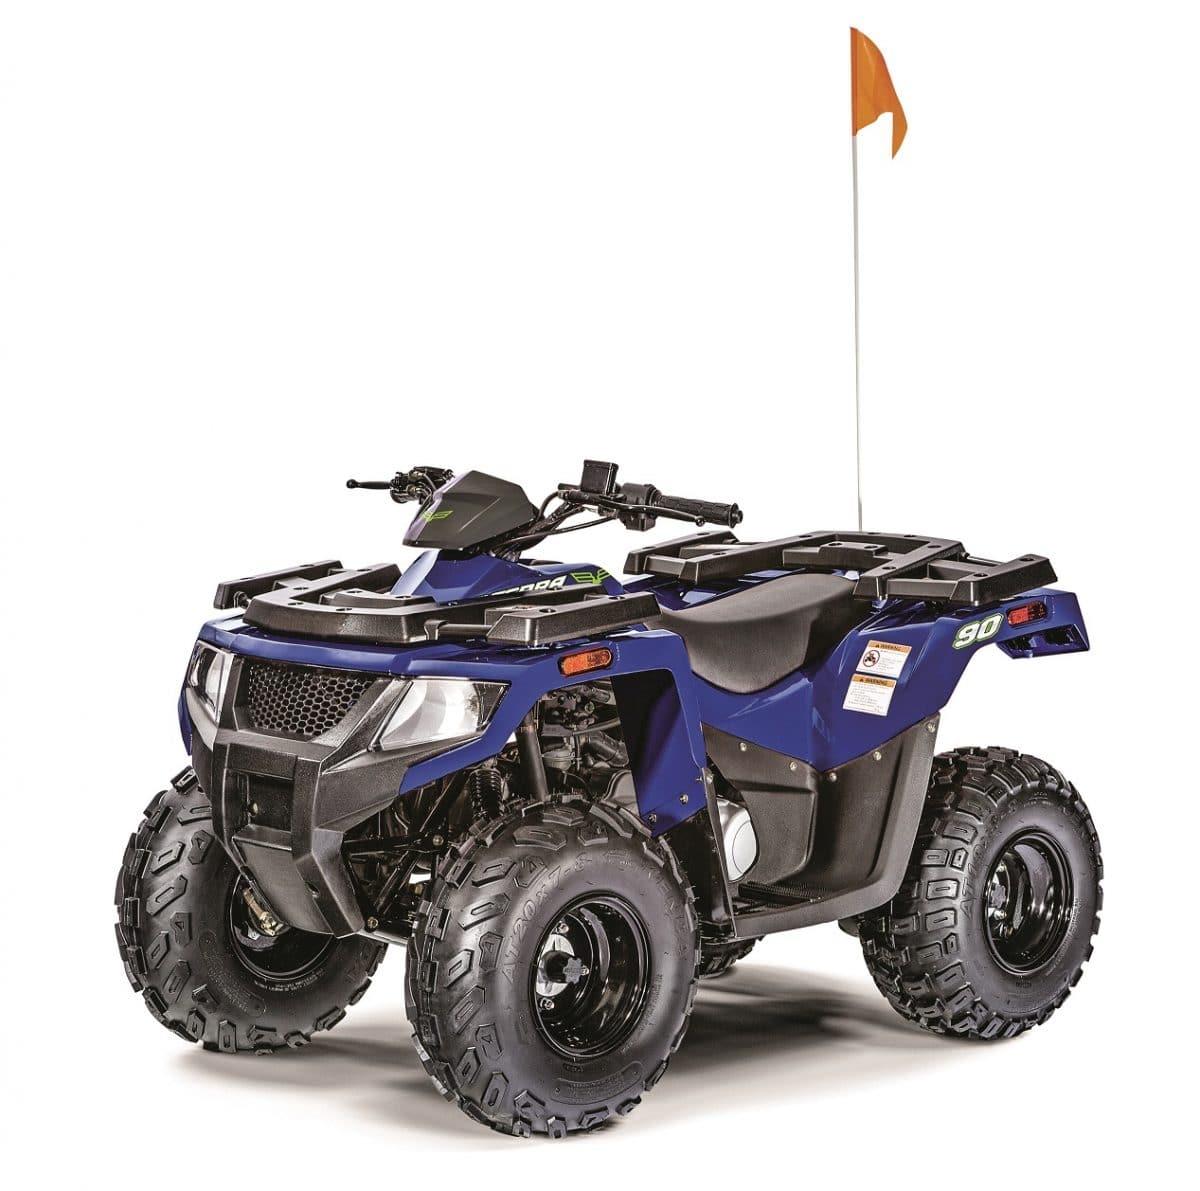 BG_102_Textron Alterra 90 2019 atv buyers guide youth quads dirt wheels magazine